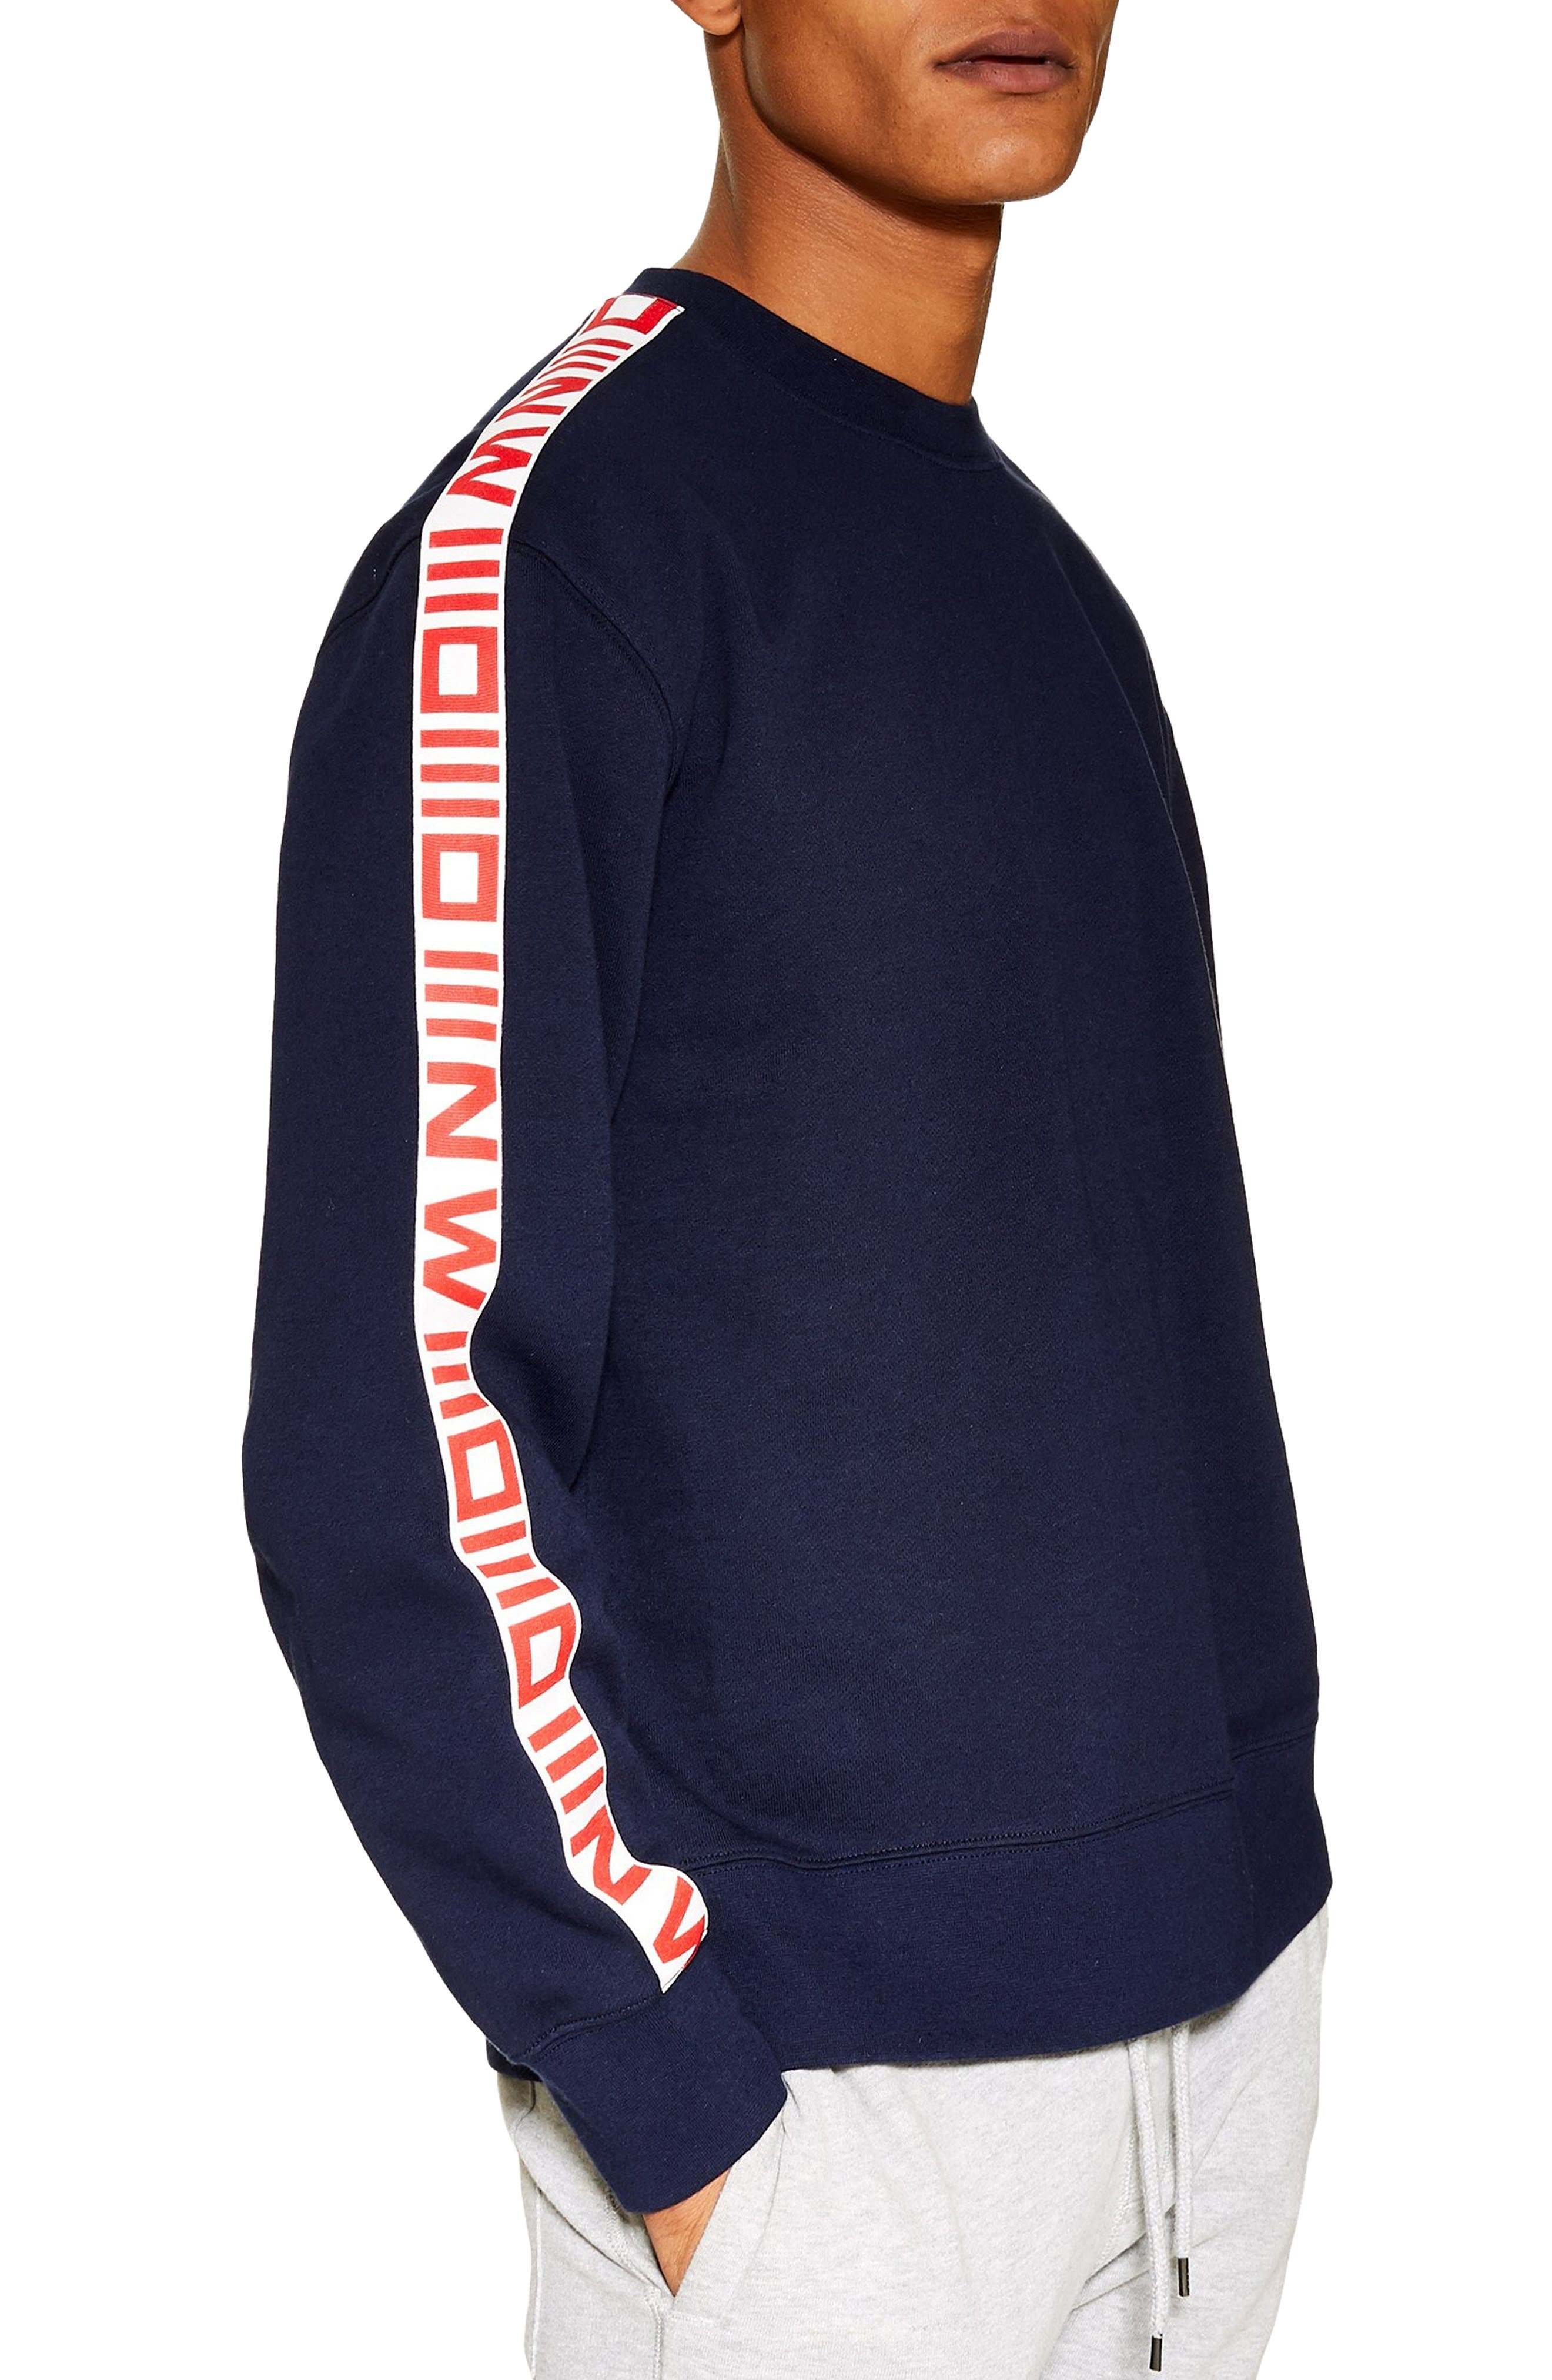 Topman Taped Crewneck Sweatshirt, Blue